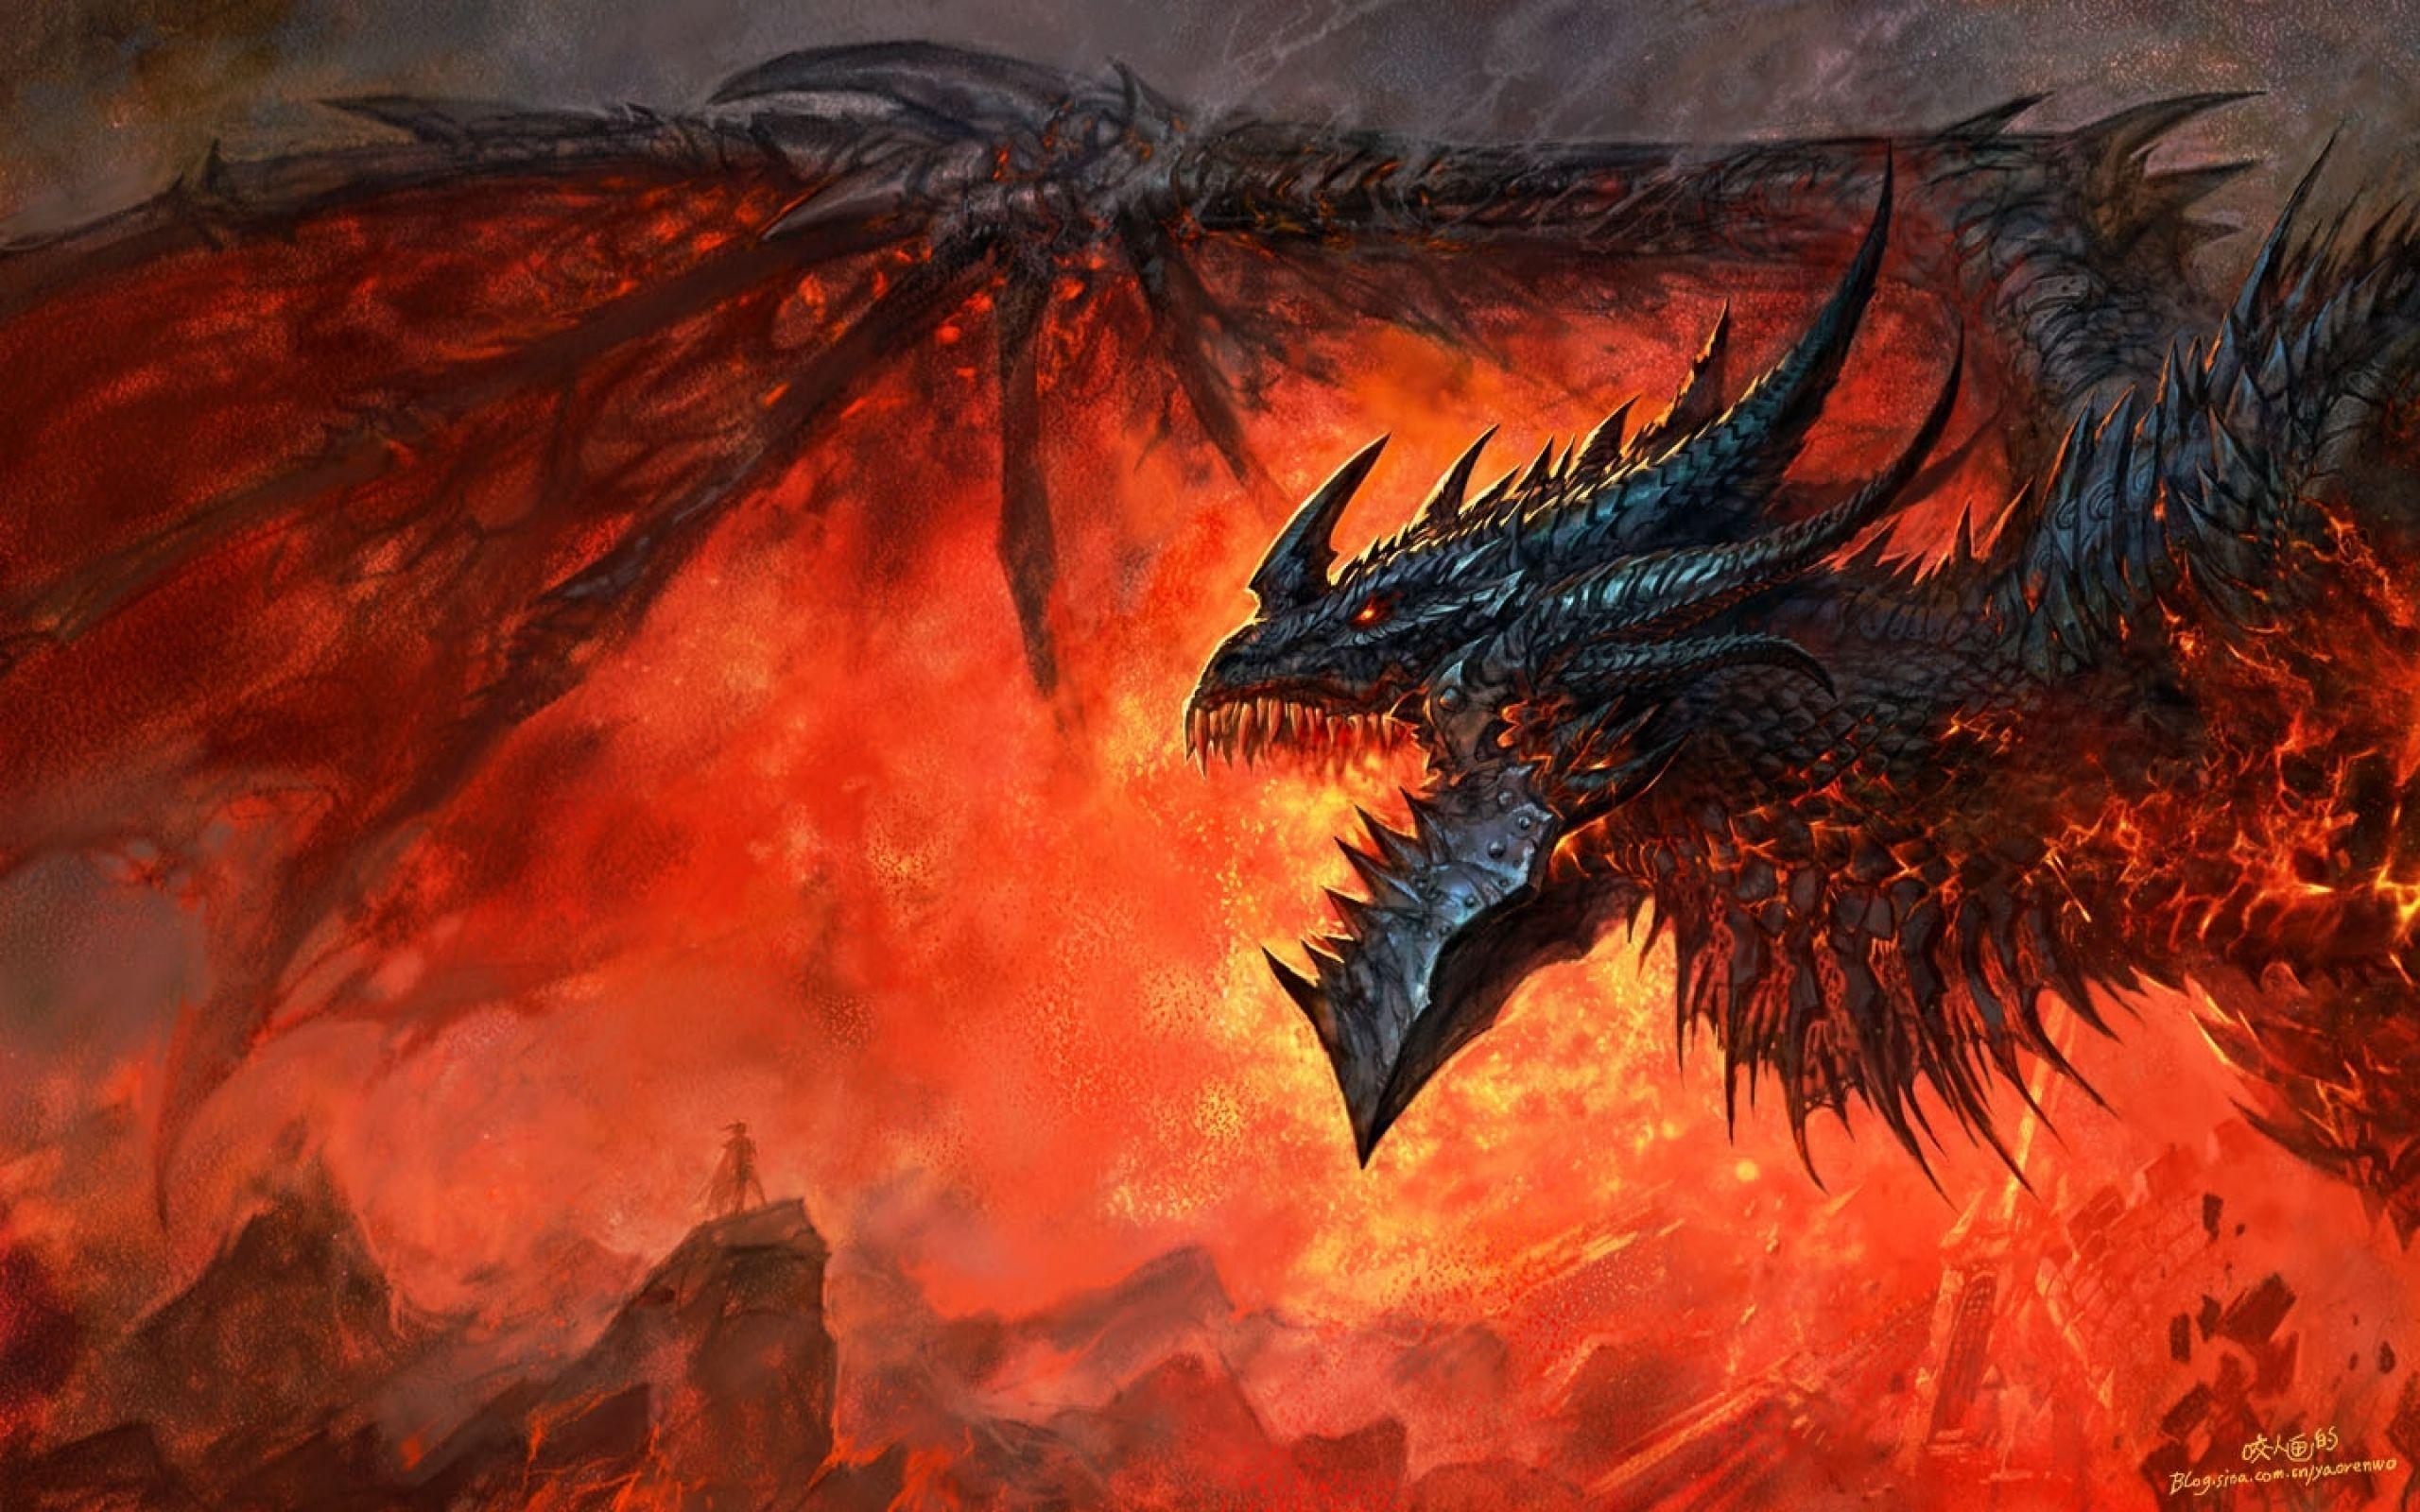 3d 4k Fbb Wallpaper Cool Dragons Dragons World Of Warcraft Deathwing